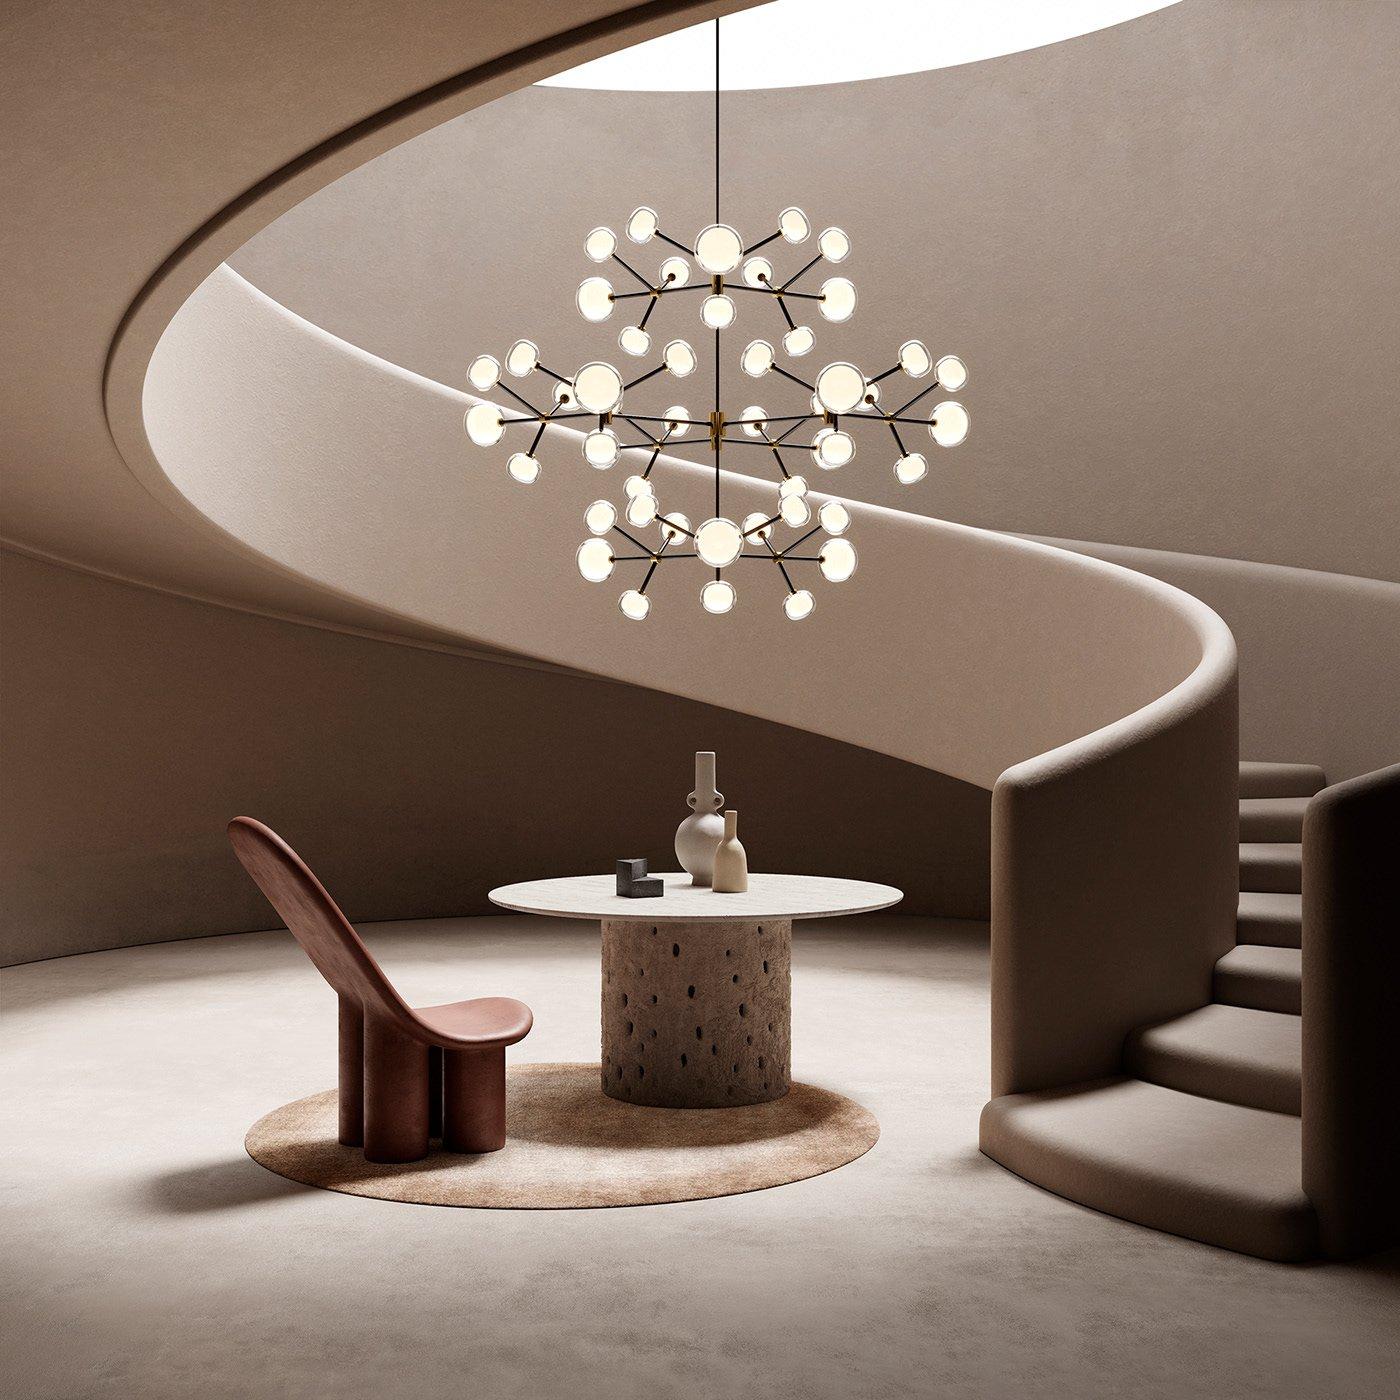 Notoostudio, studio de rendus 3D, interiors virtuels et set design